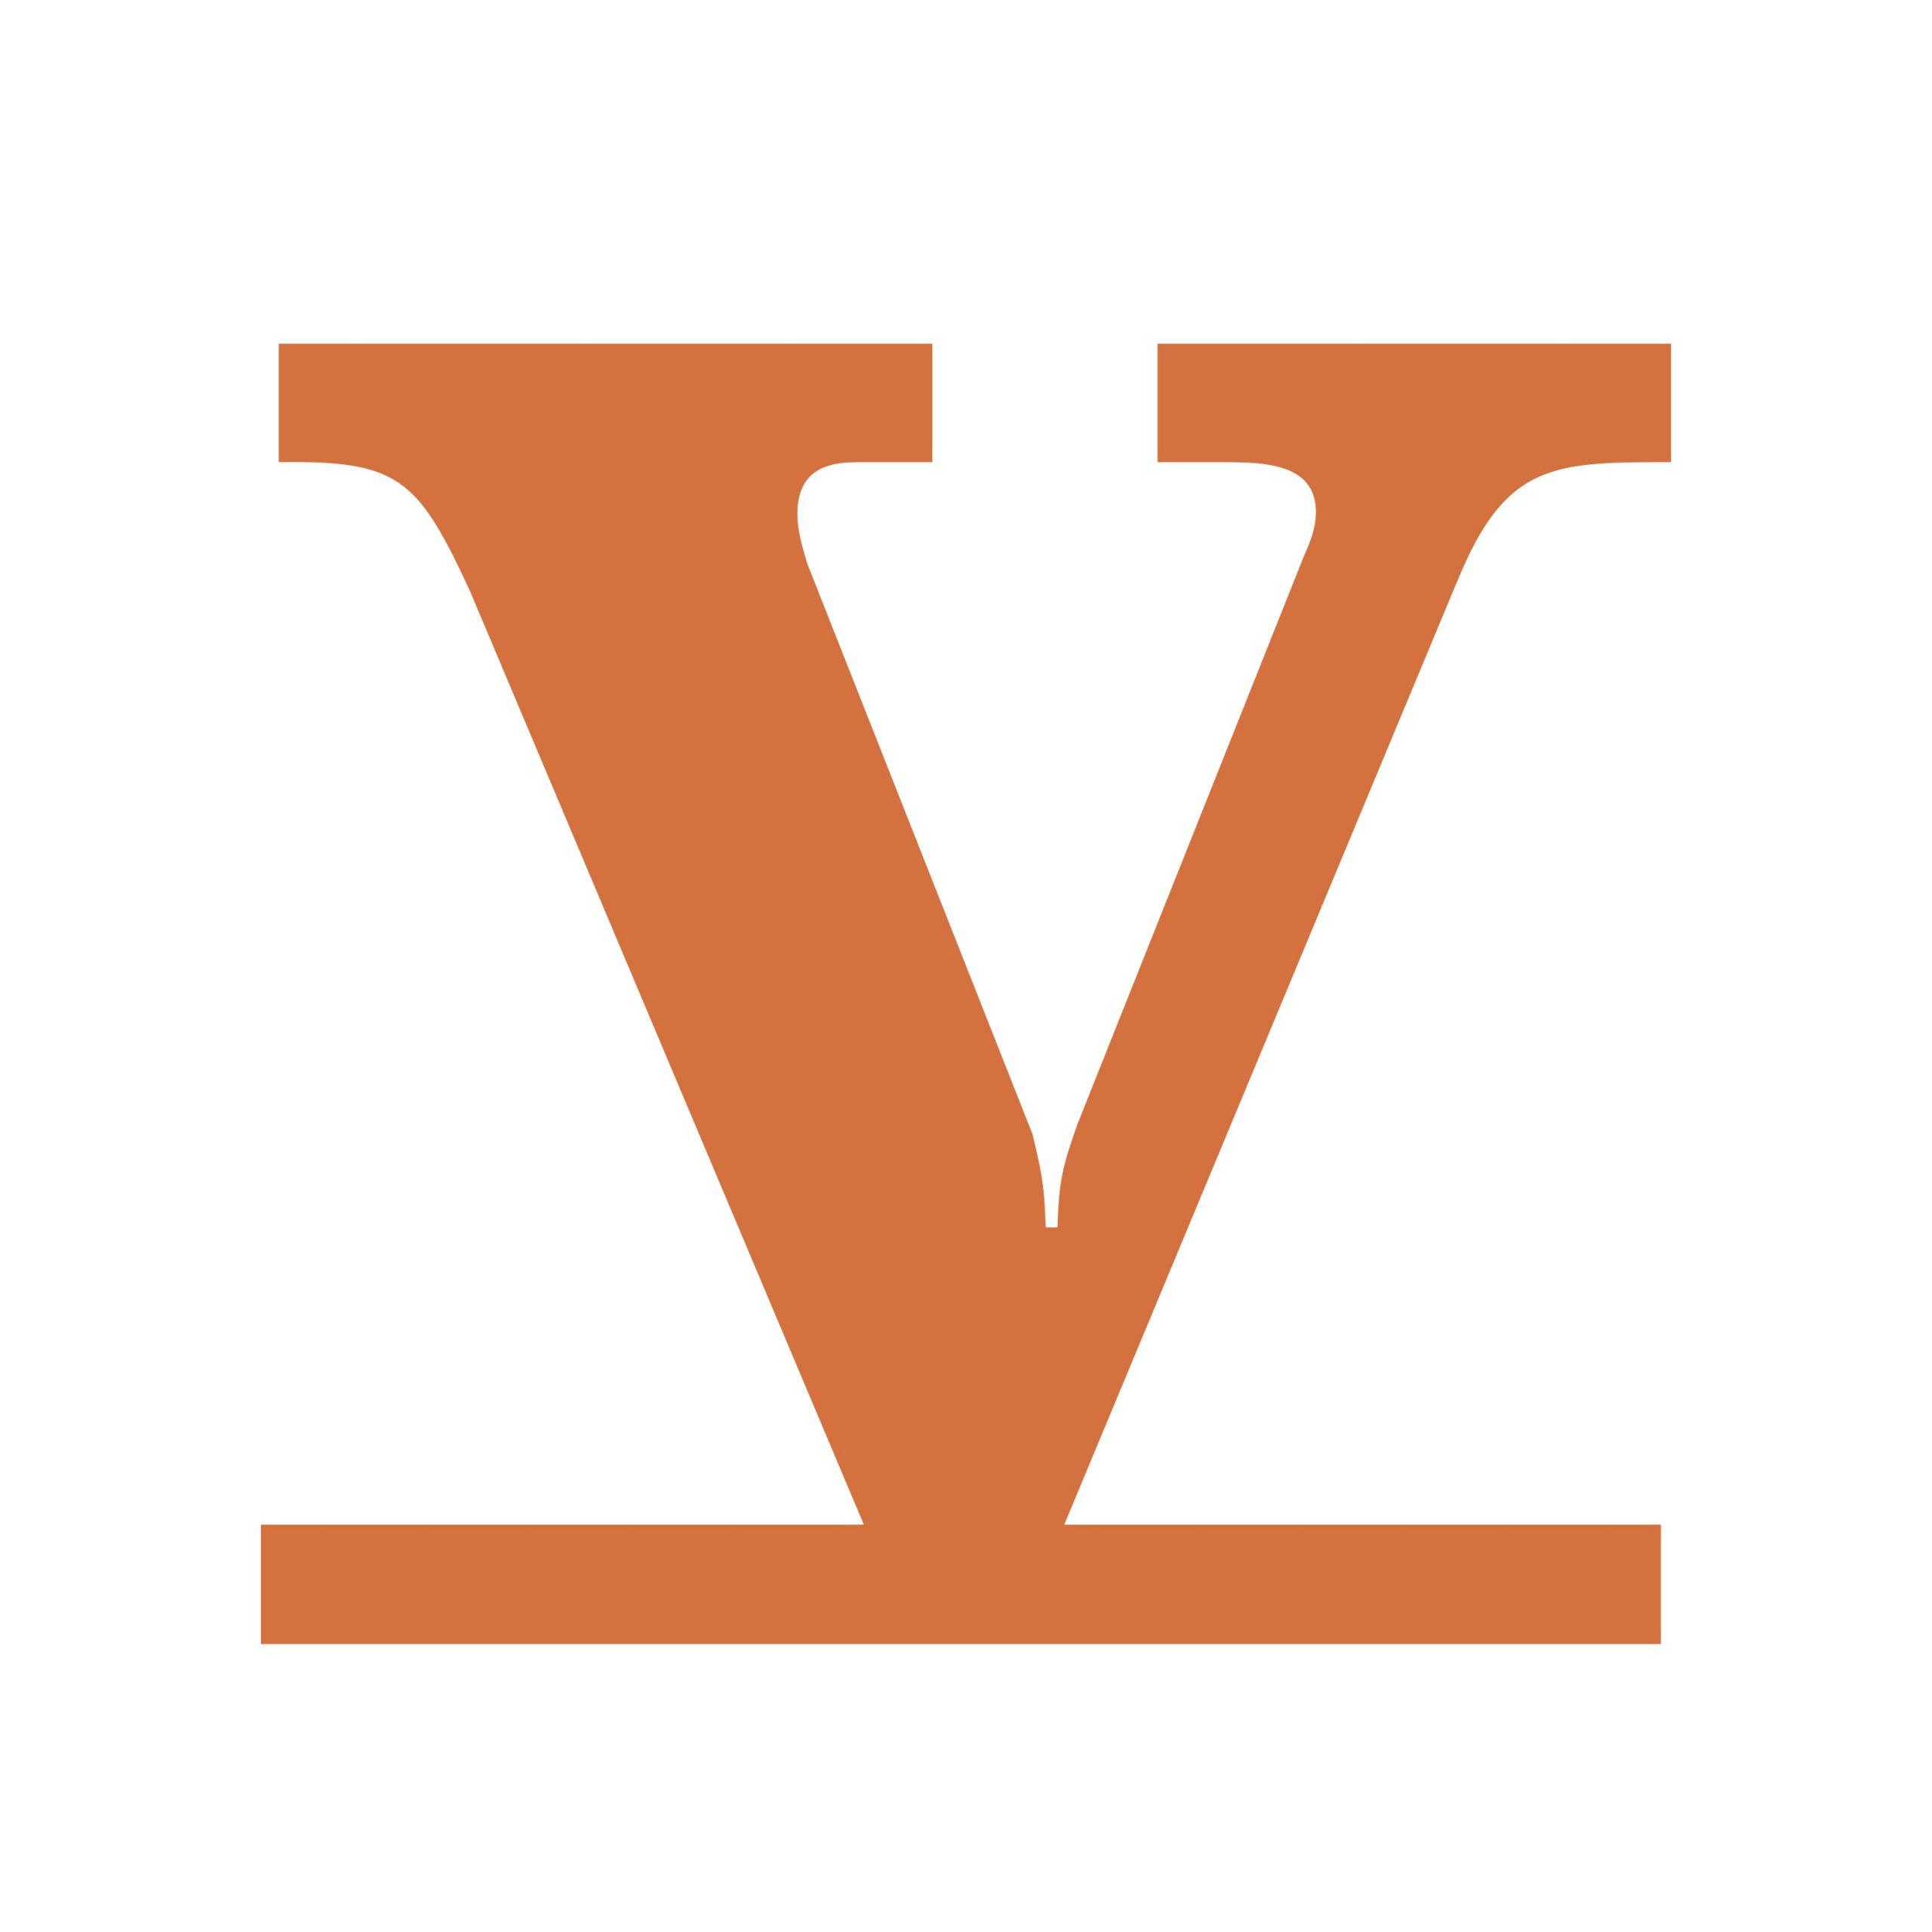 The Fifth Estate V Logo 2020